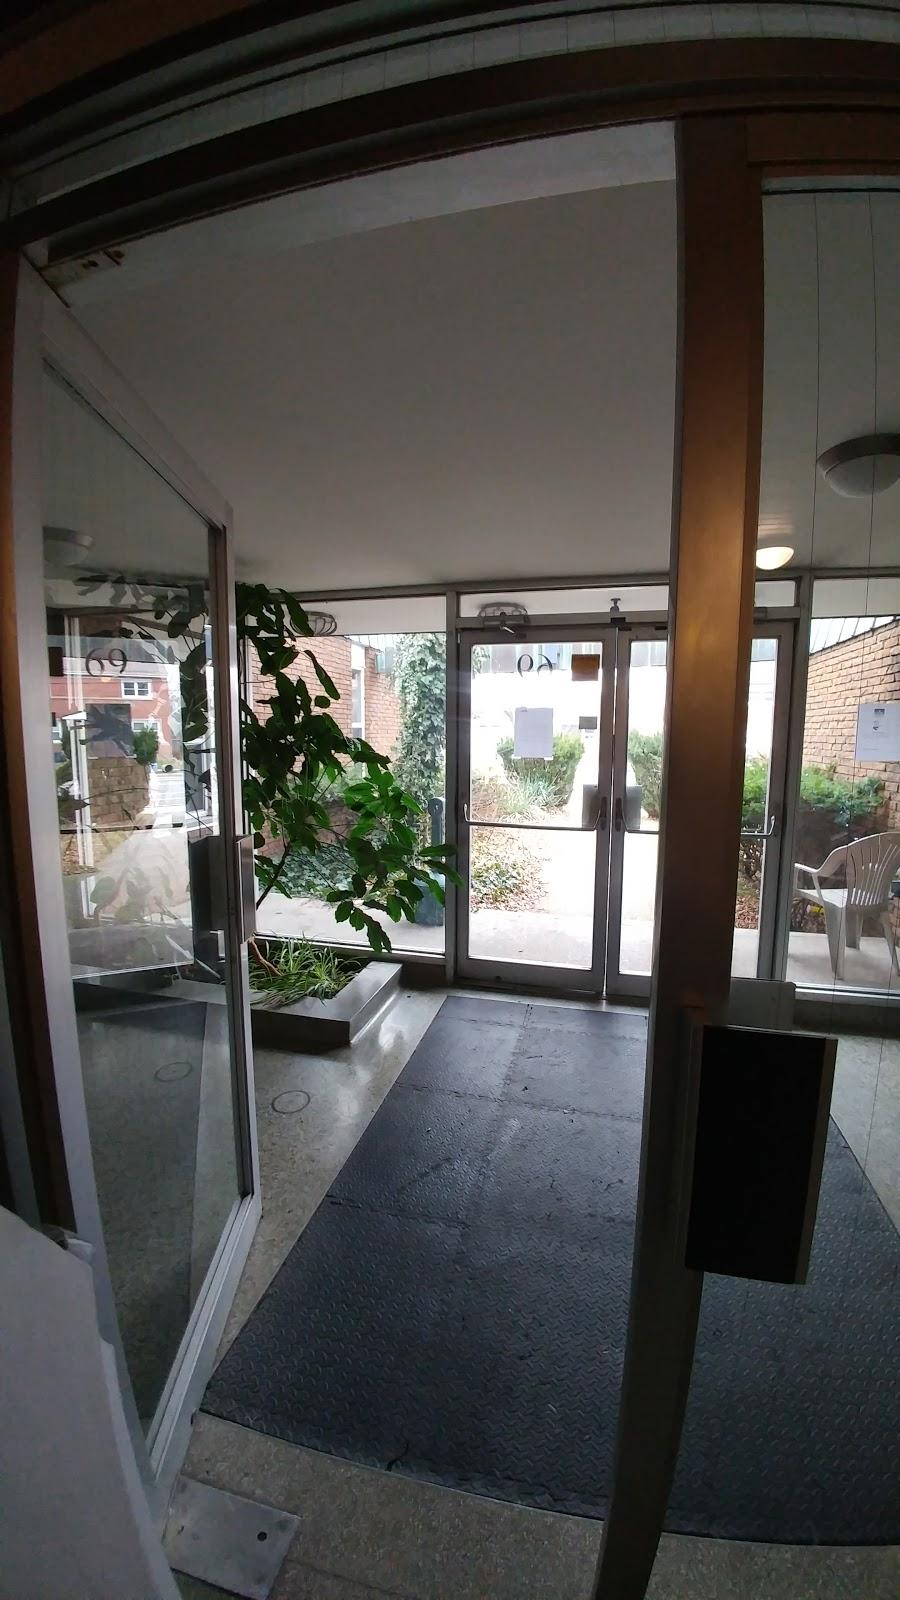 Binkley Student Residence   lodging   69 Sanders Blvd, Hamilton, ON L8S 3J8, Canada   9055282395 OR +1 905-528-2395